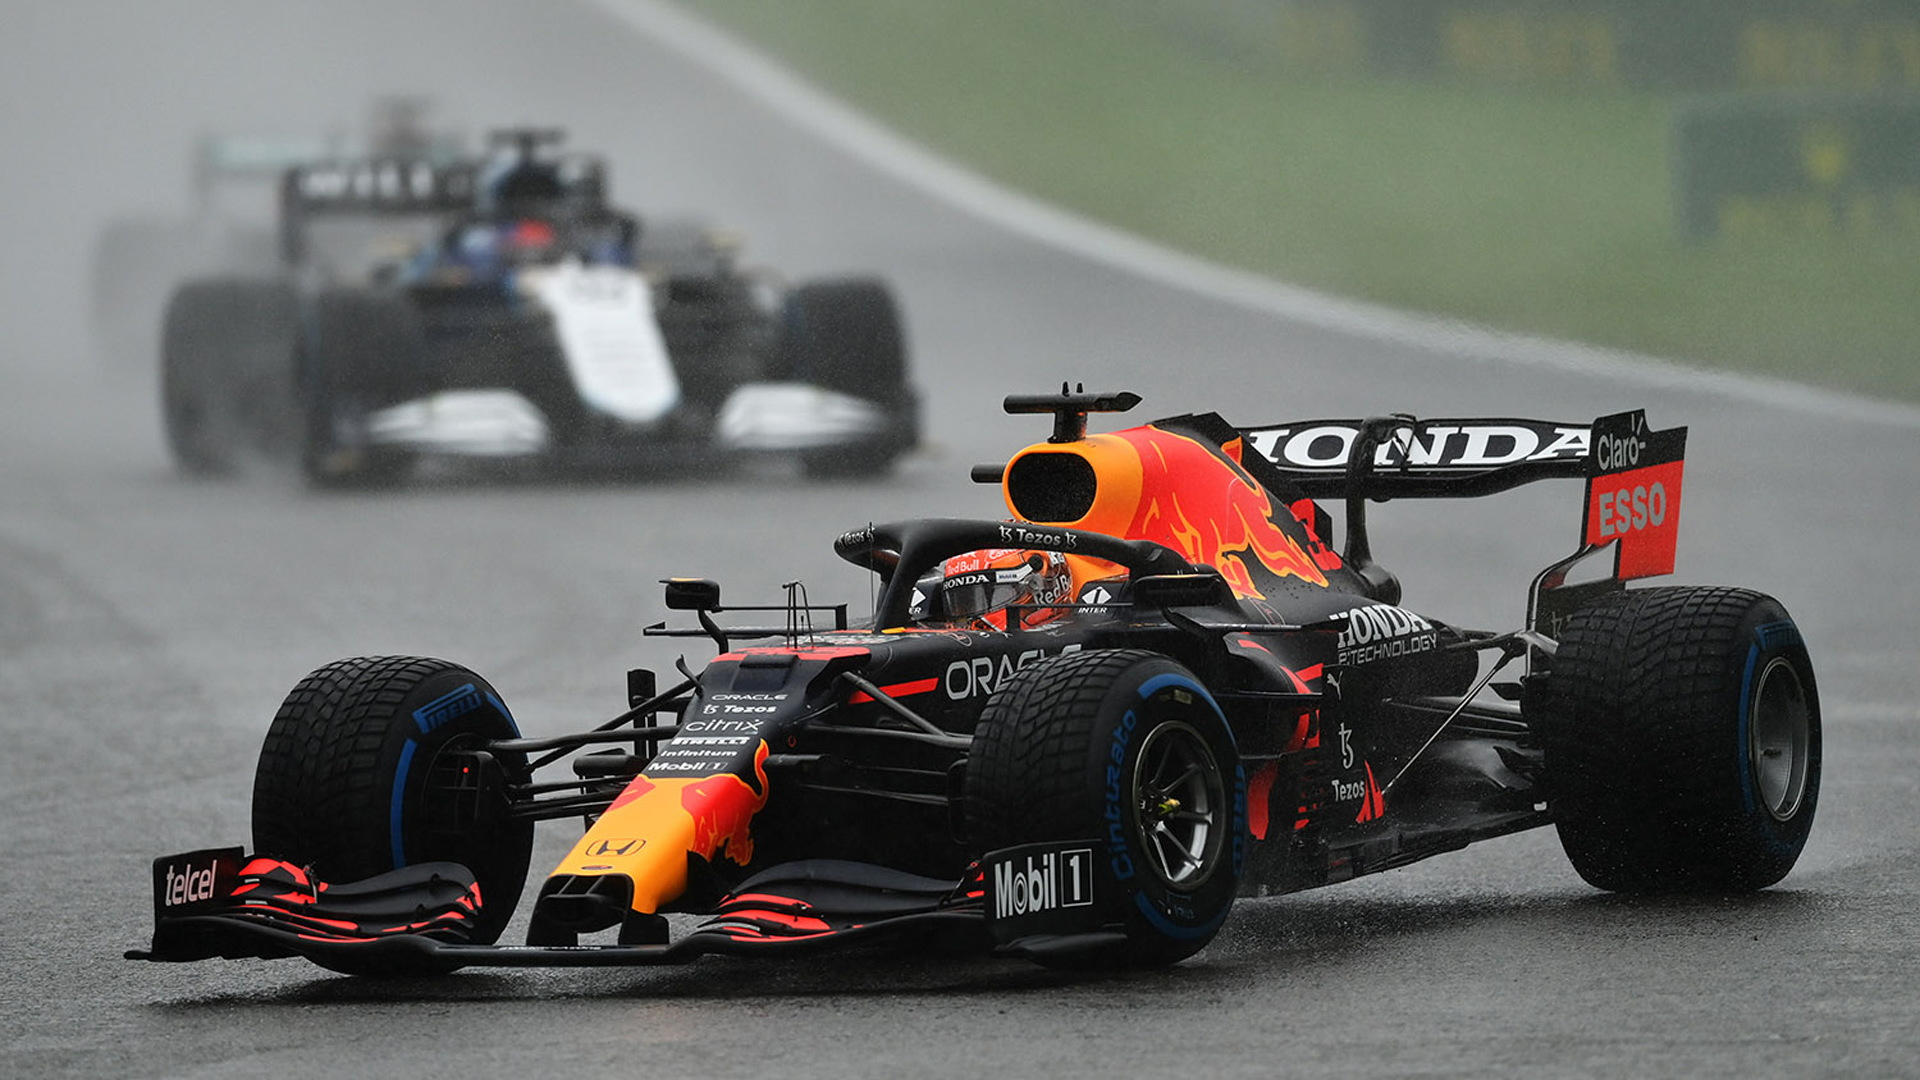 2021 Formula One Belgian Grand Prix